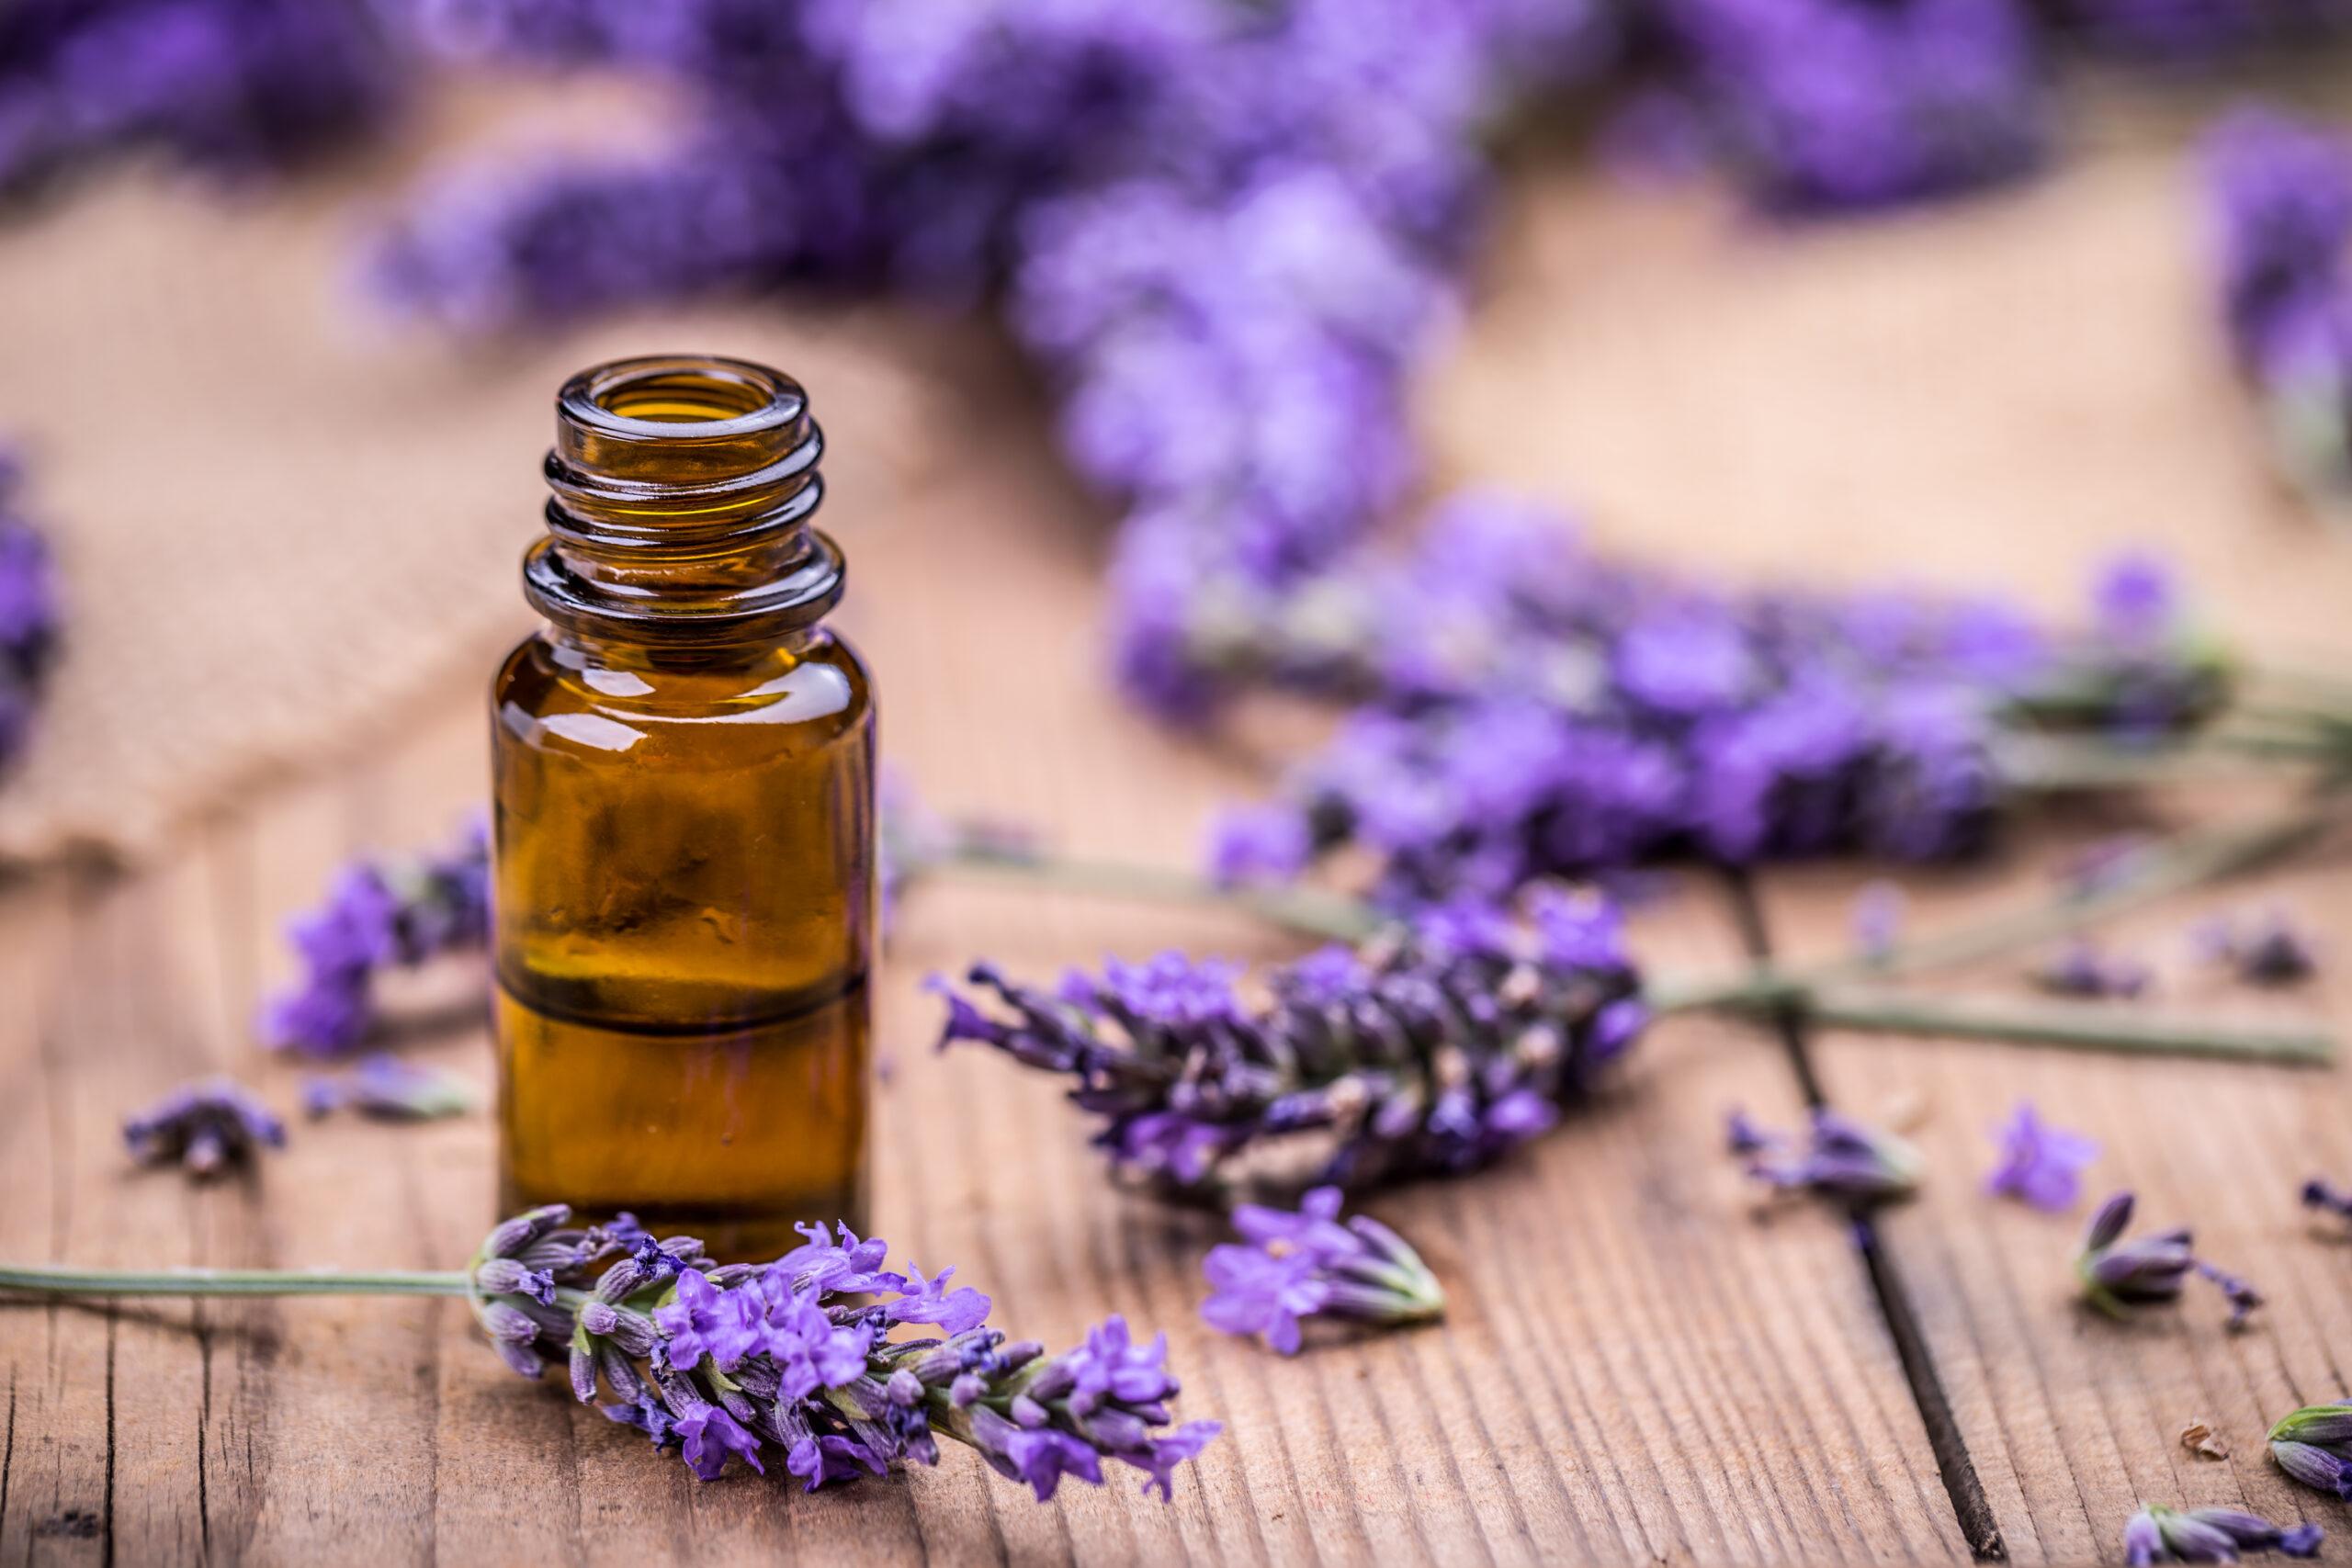 Lavender Essential Oil Distillation Workshop